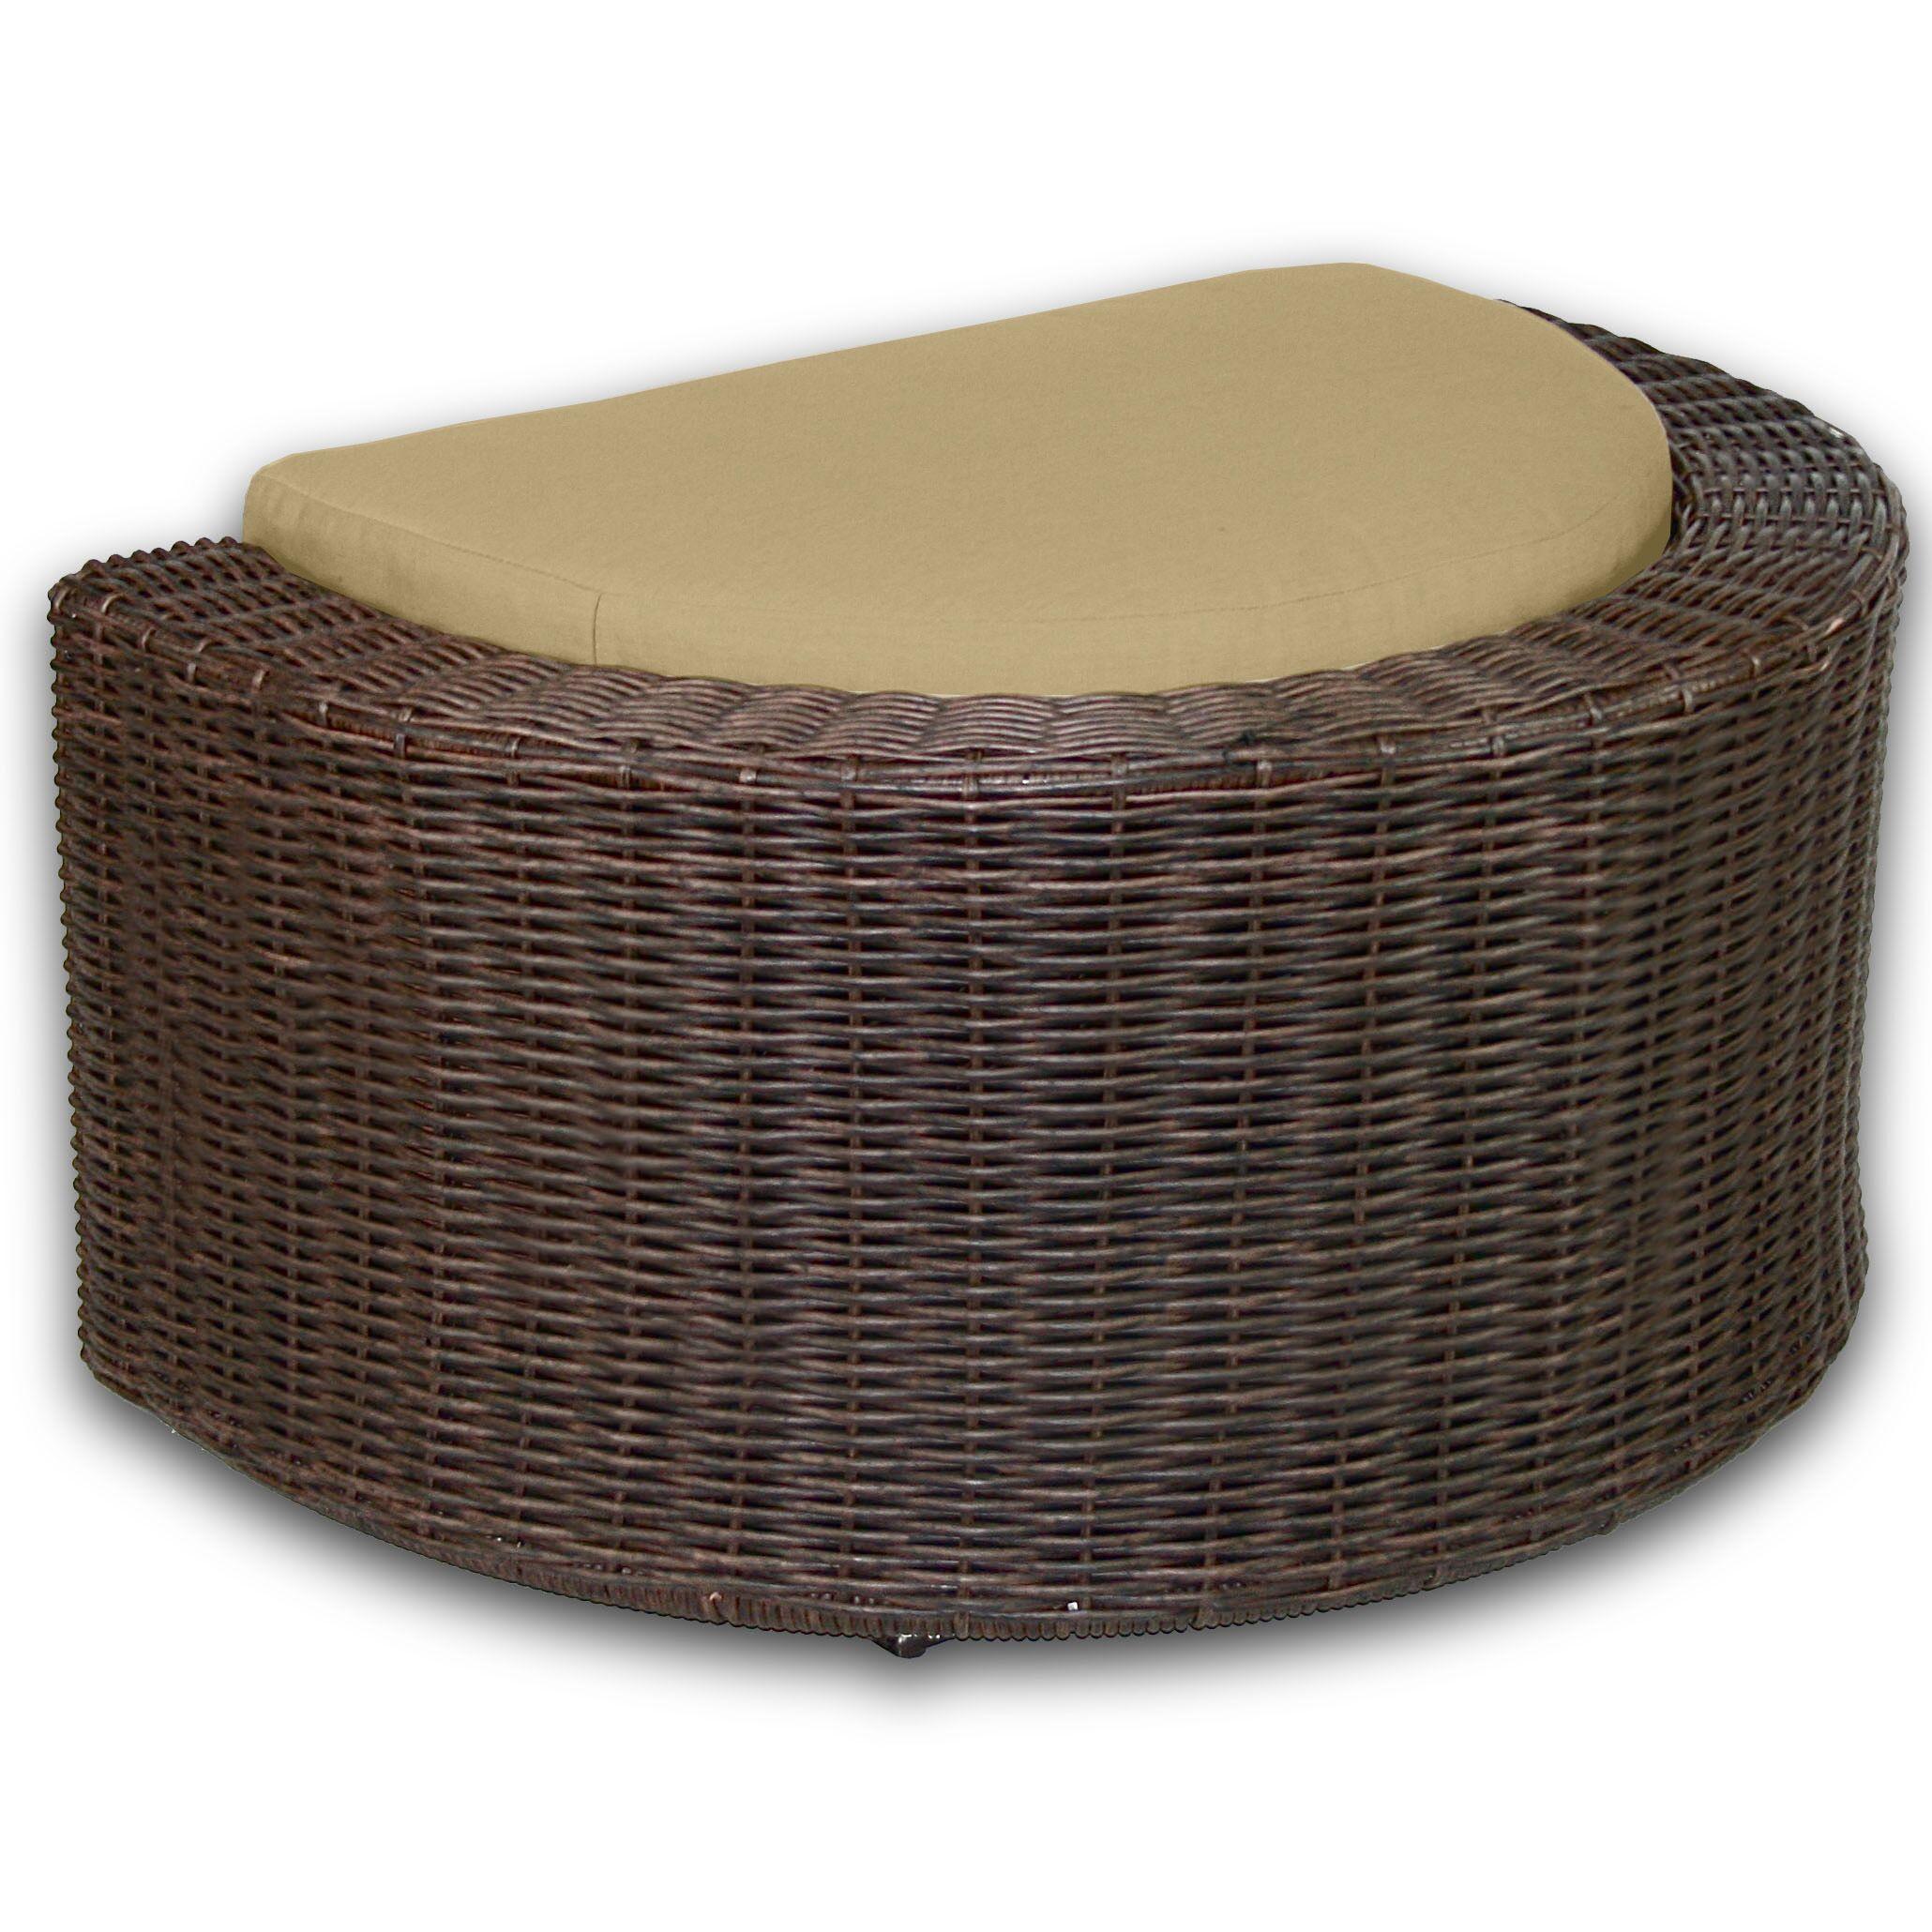 Palomar Ottoman with Cushion Fabric: Dijon